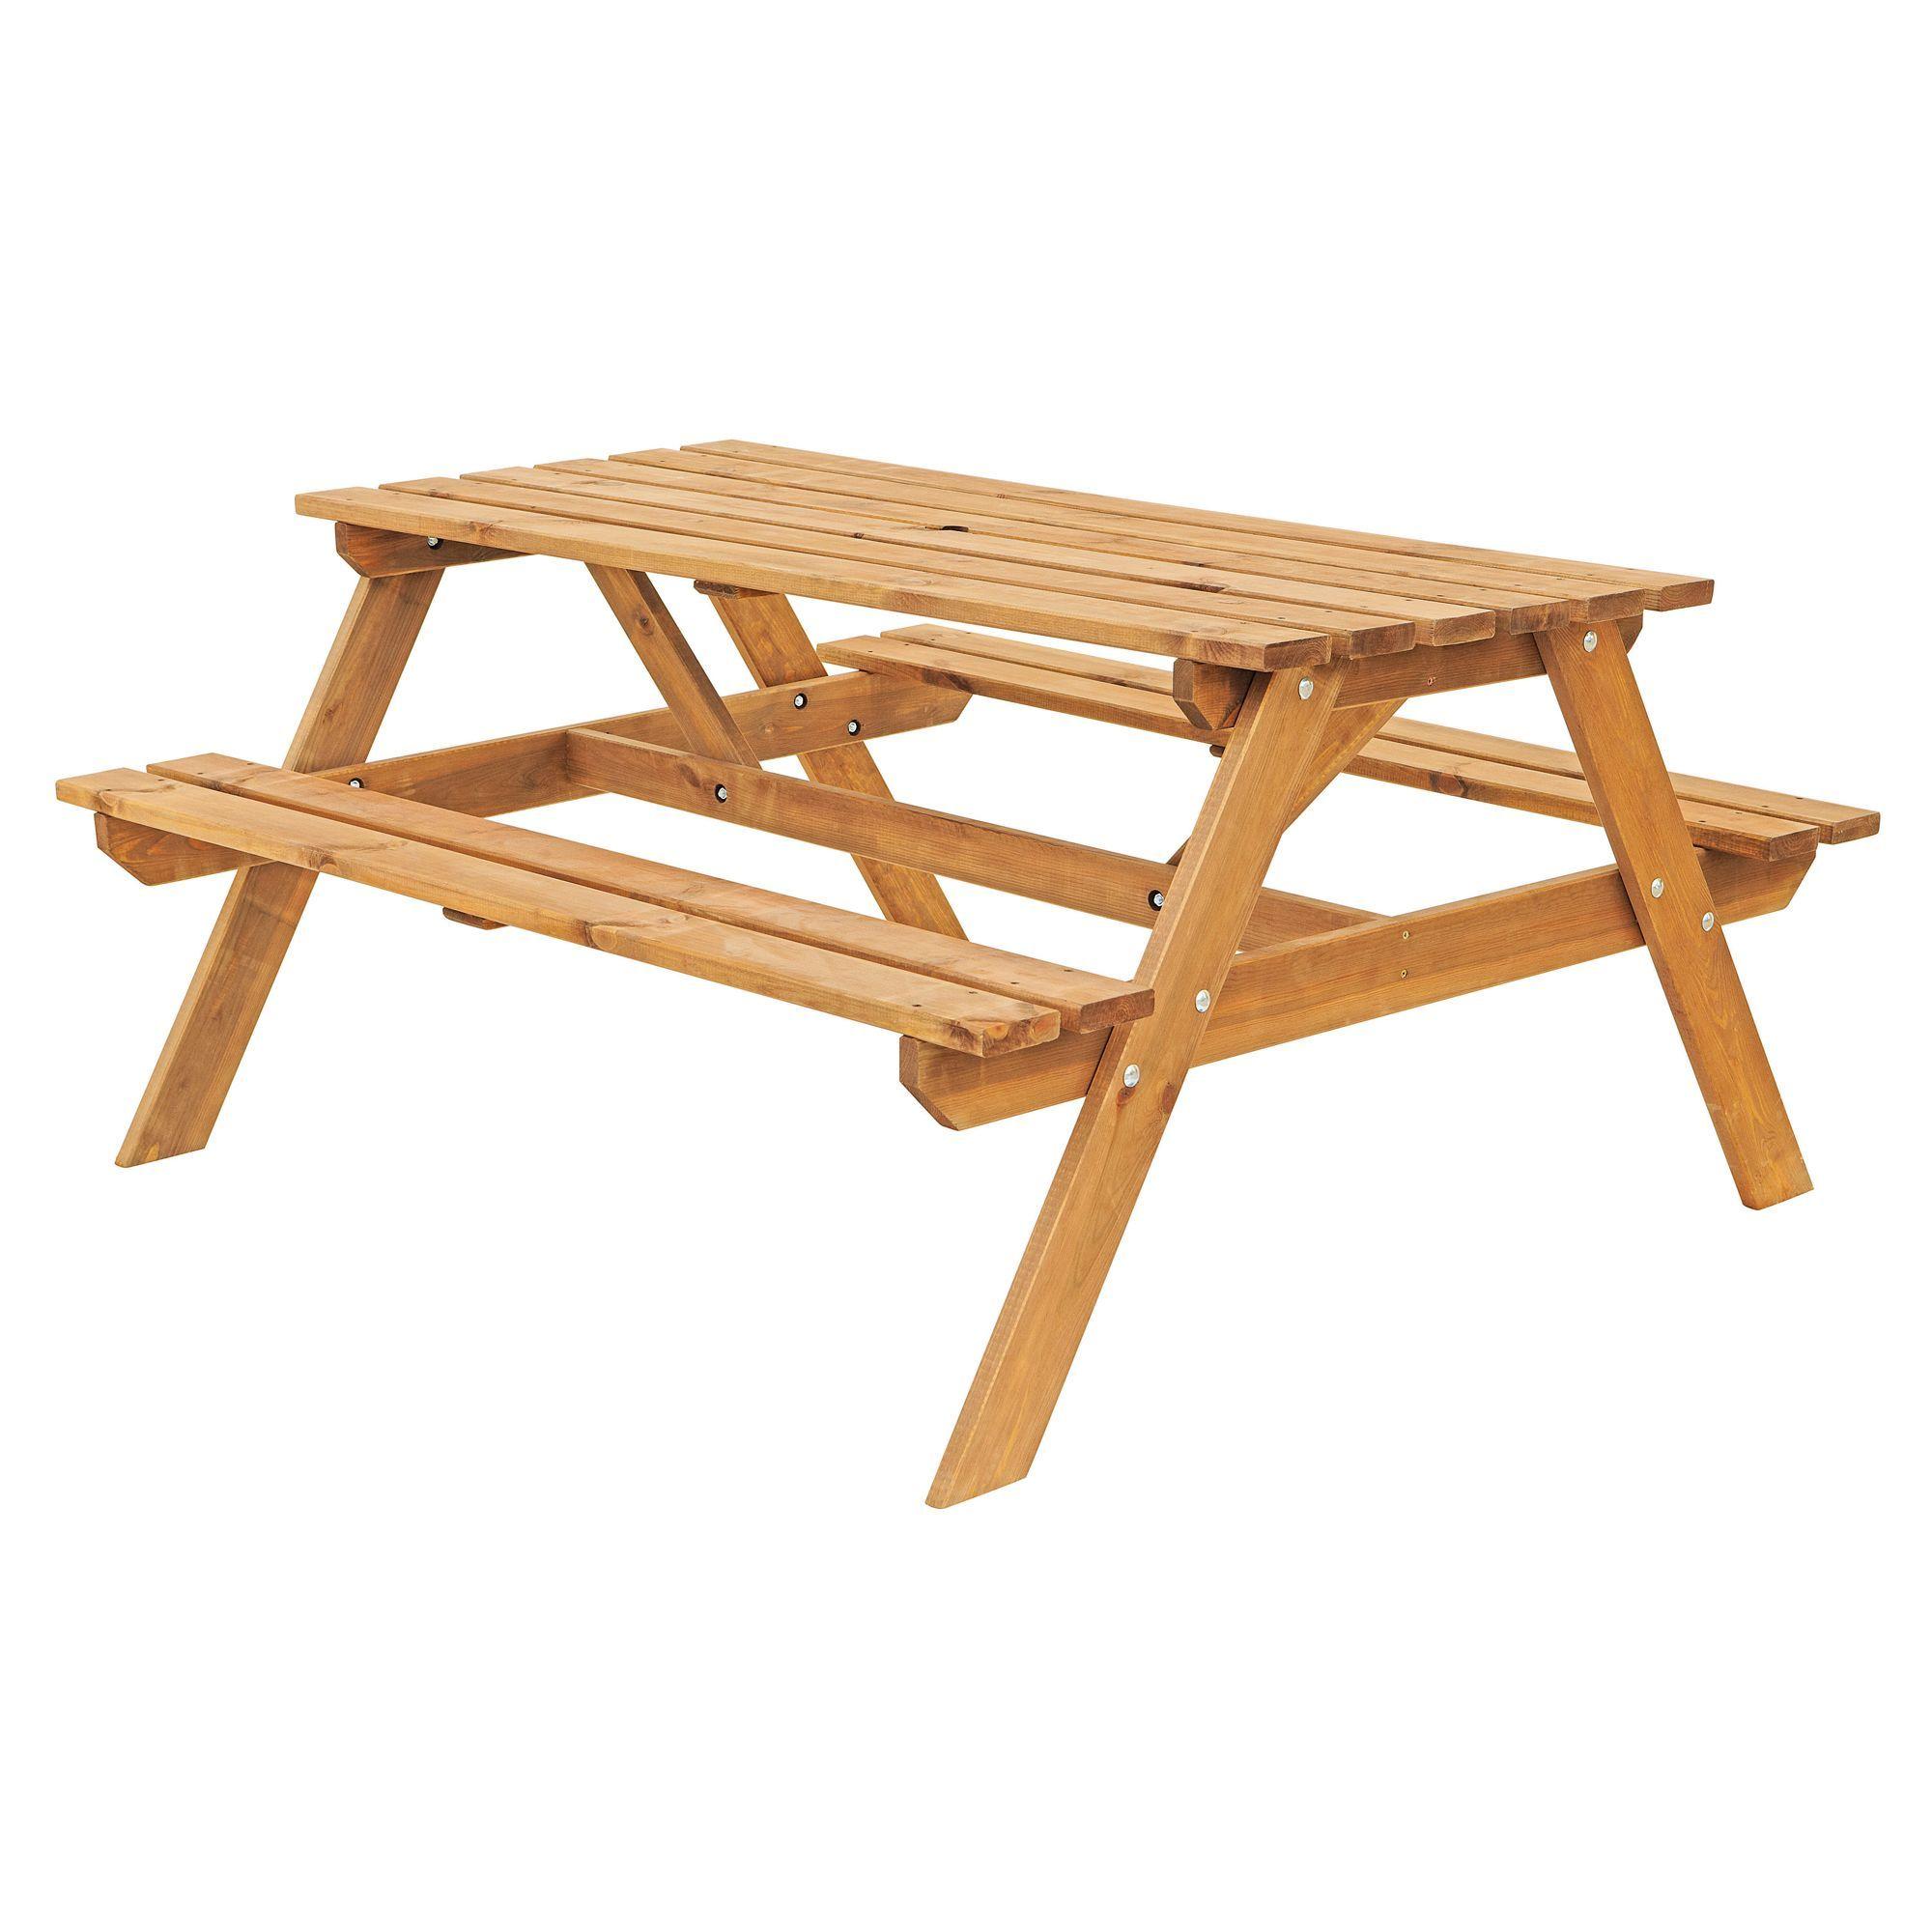 Folding Picnic Chairs B Q Baby Lounge Chair Batam Timber Bench Departments Diy At Garden Dreams